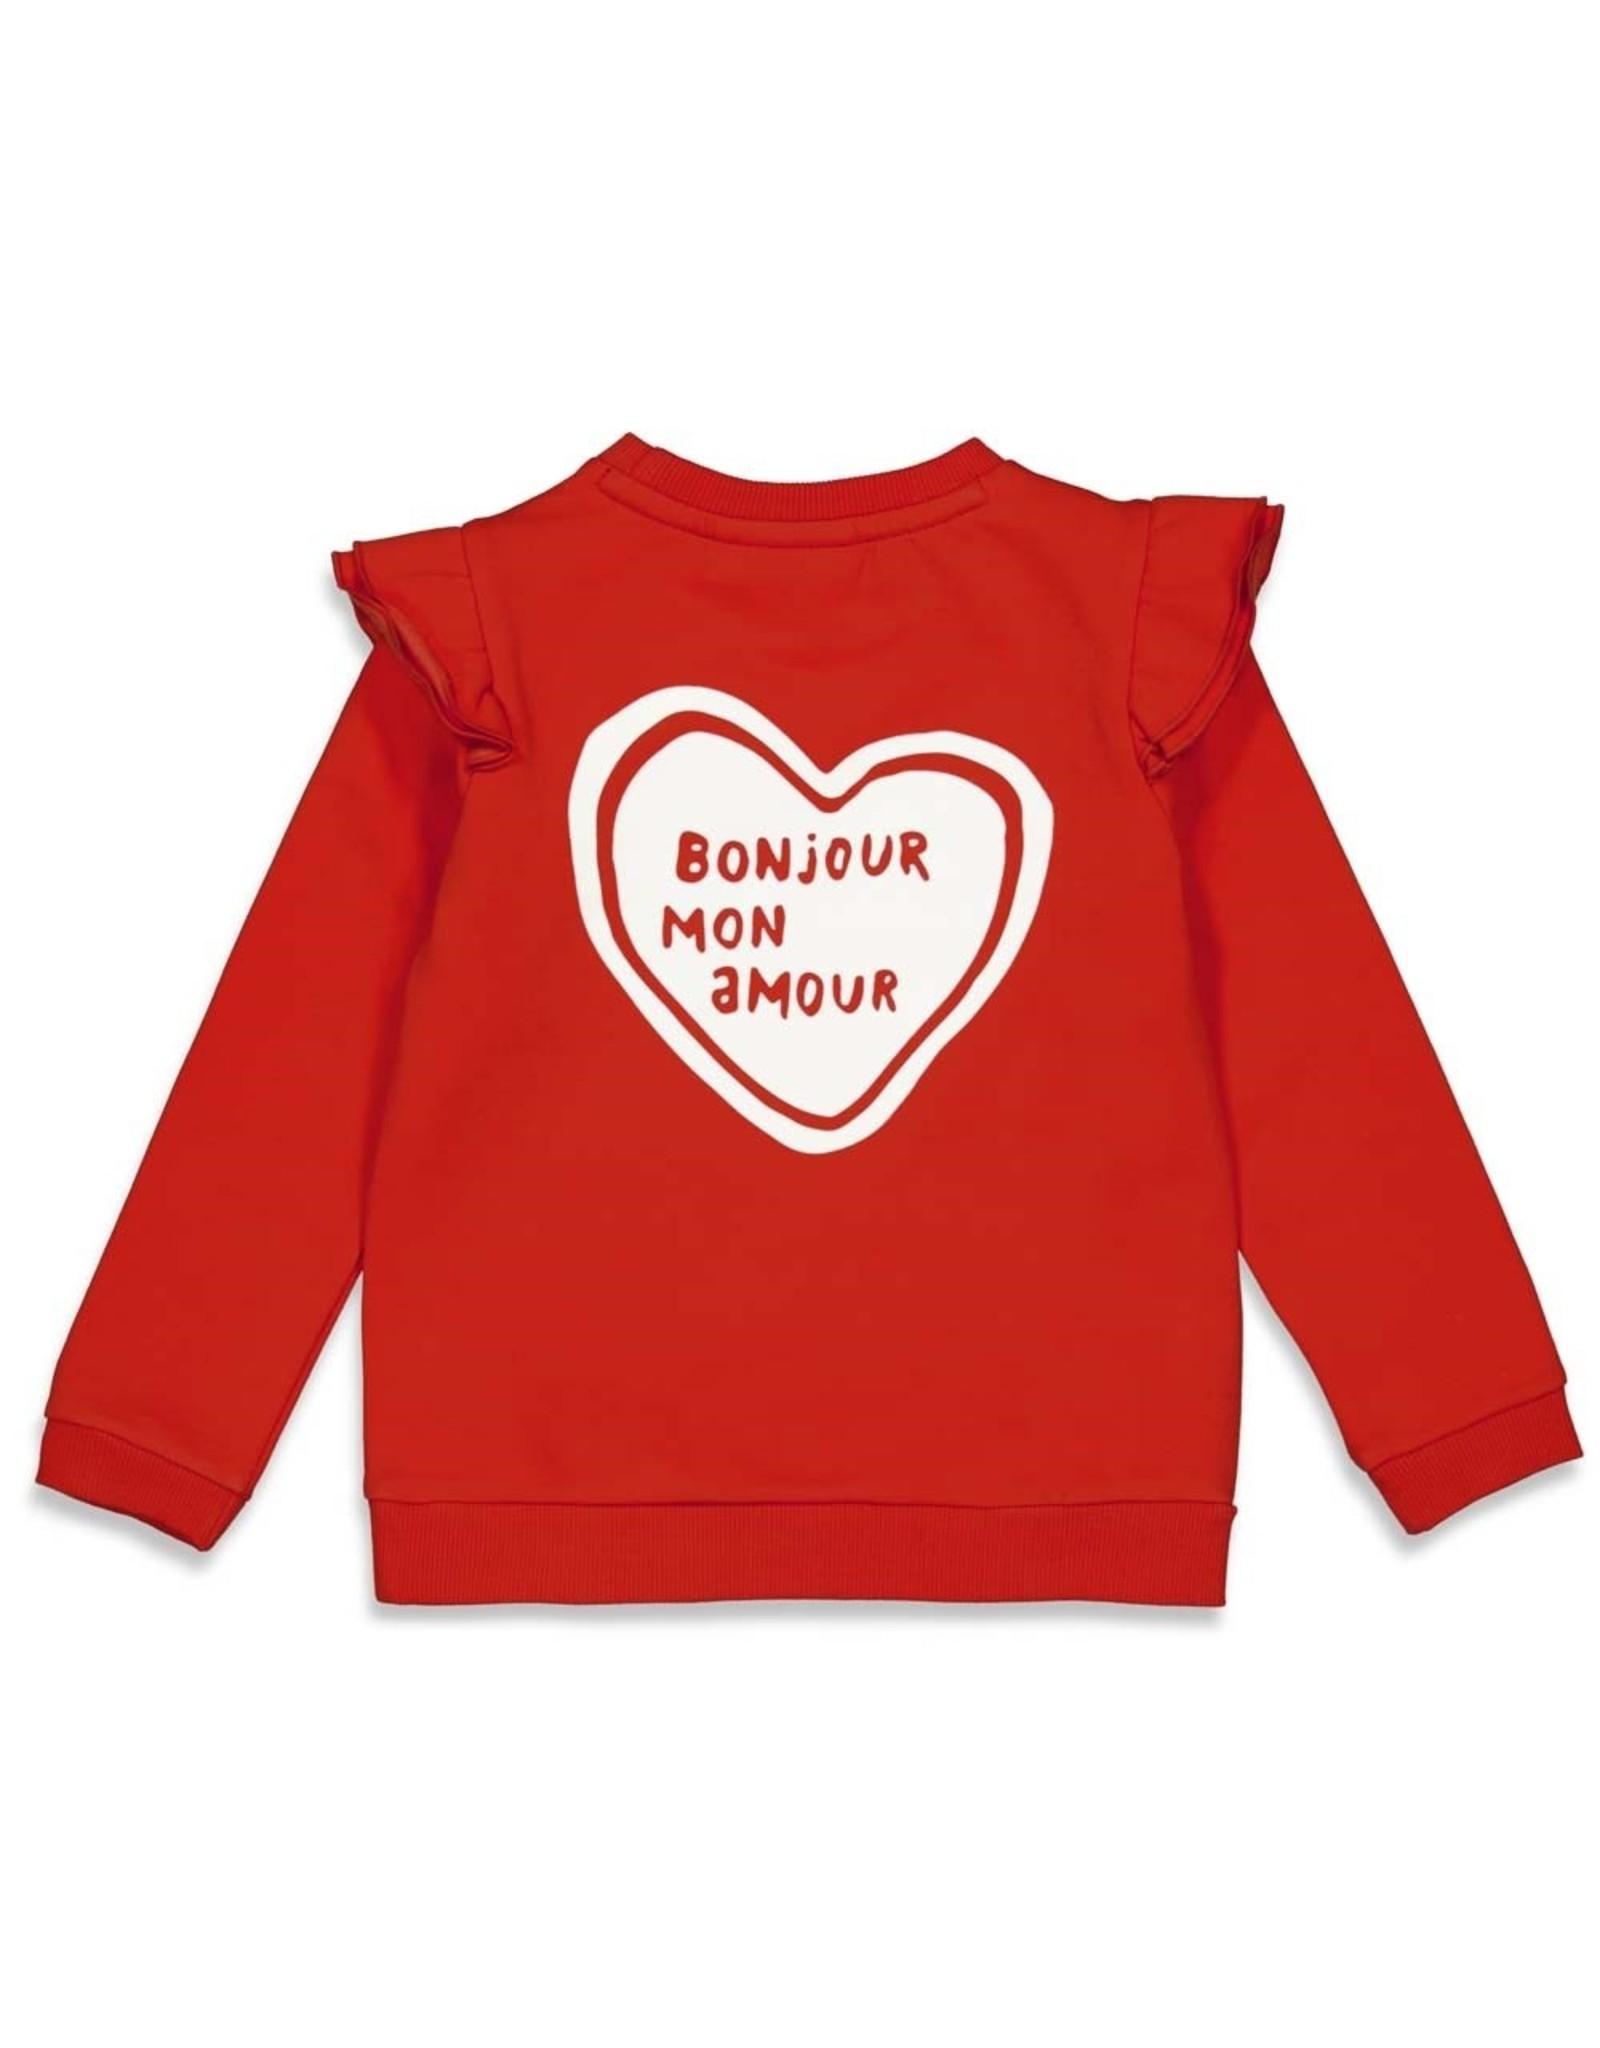 Jubel Jubel sweater rood Club Amour